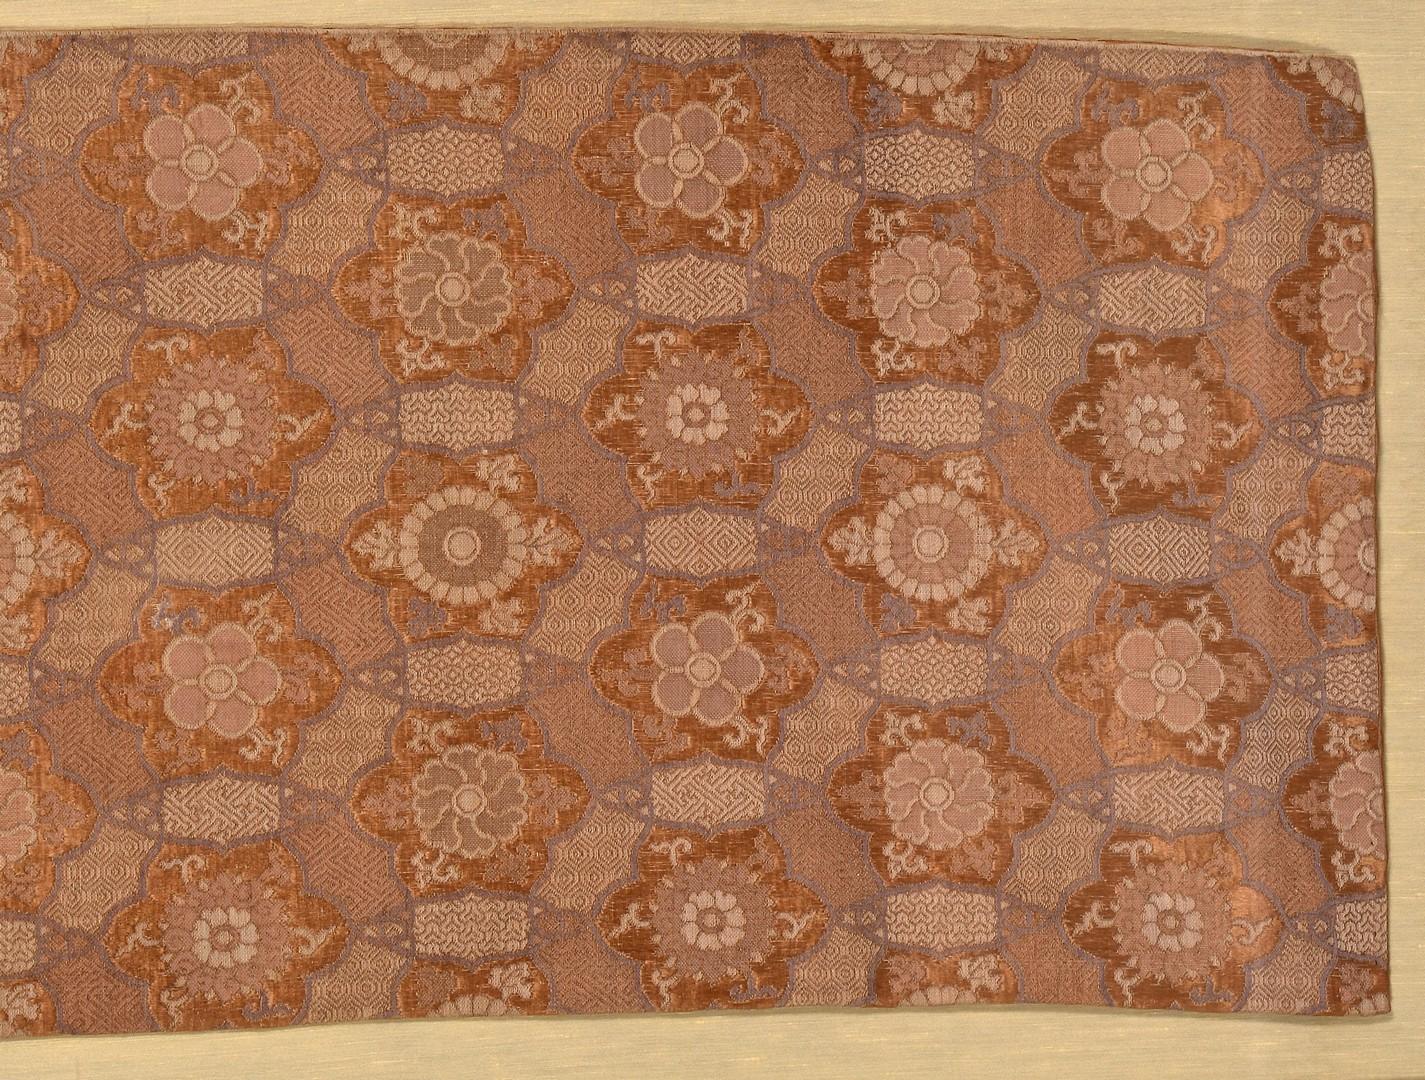 Lot 931: 3 Asian Silk Brocade Textiles